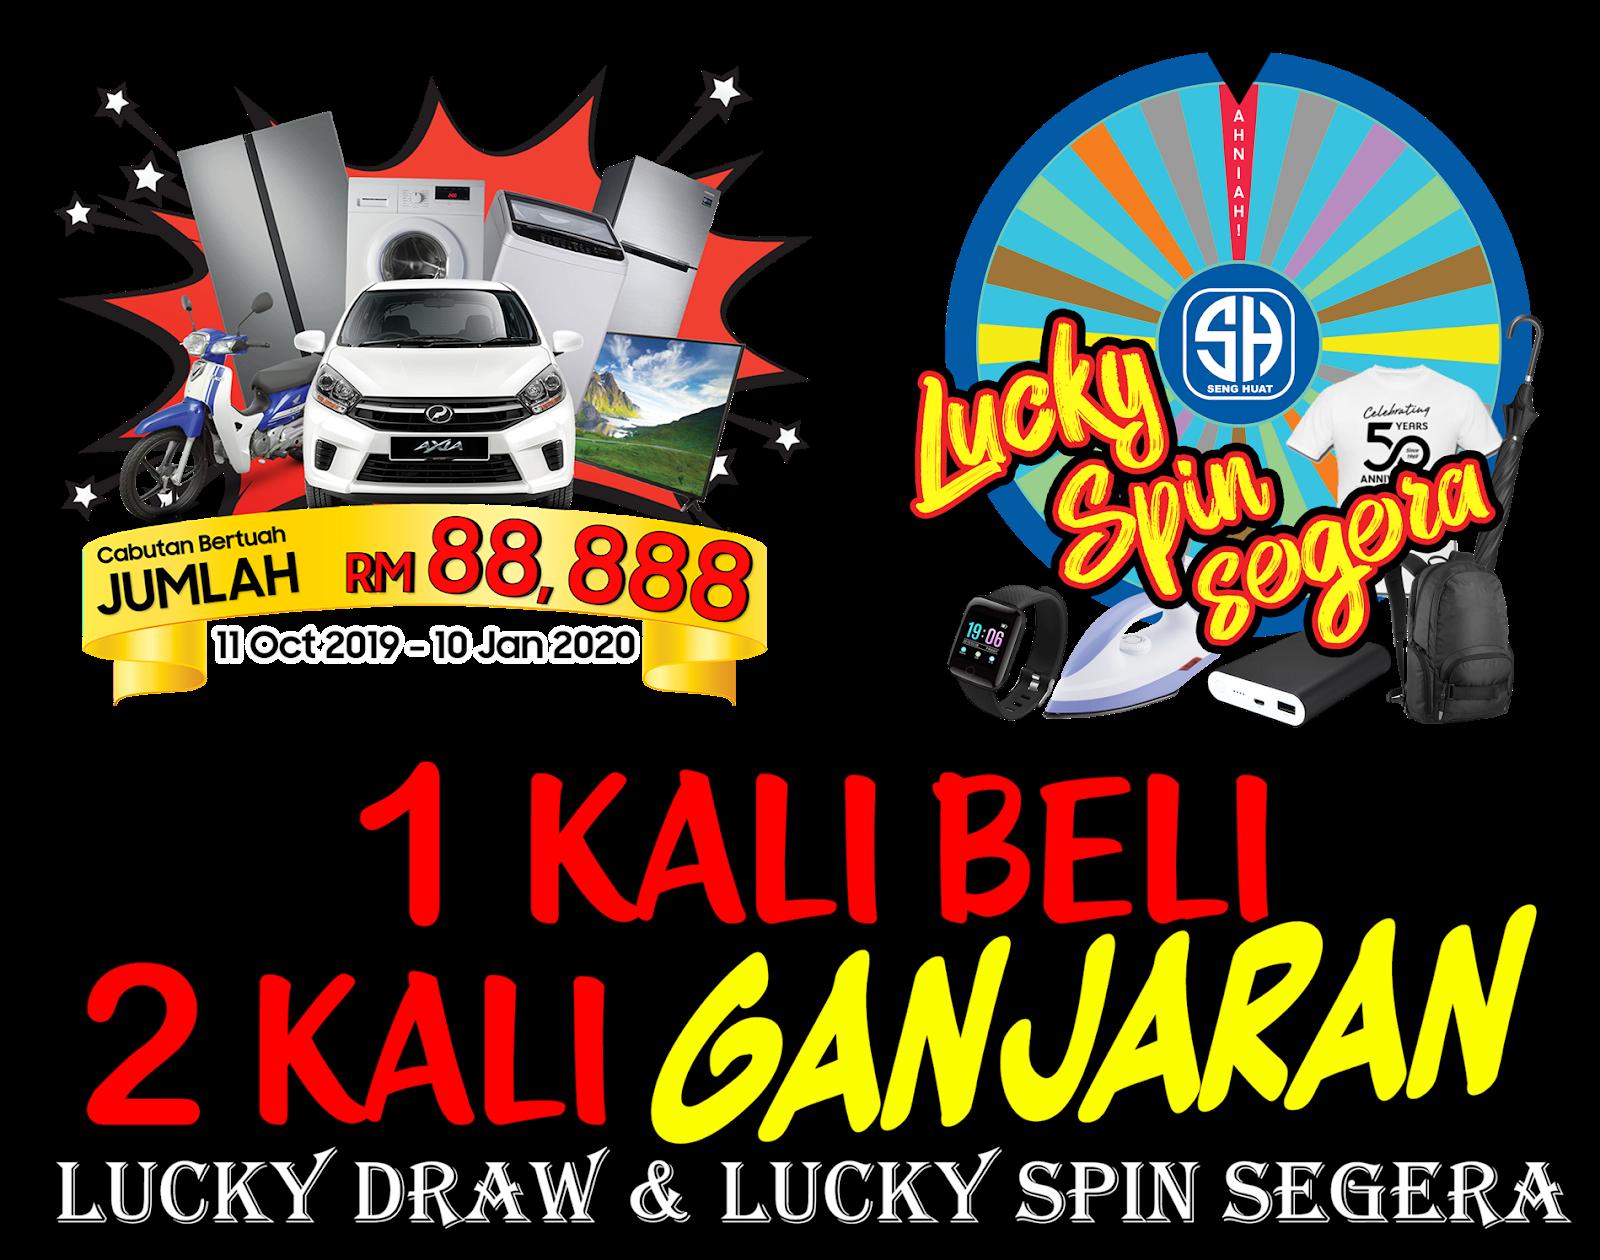 Seng Huat Lucky Draw Instructions